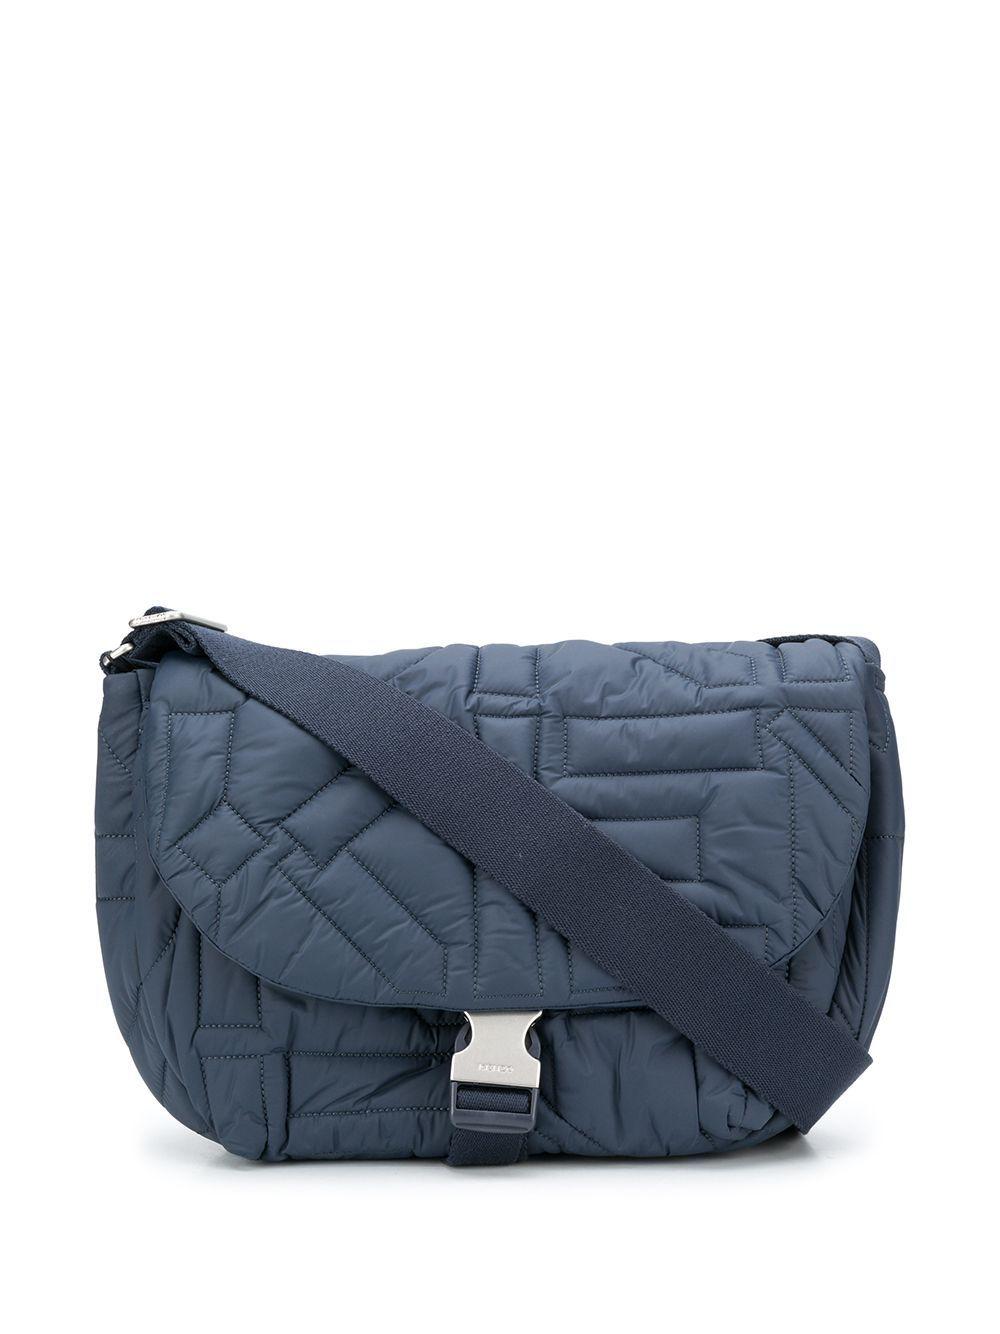 Kenzo Shoulder bags KENZO WOMEN'S BLUE POLYAMIDE SHOULDER BAG